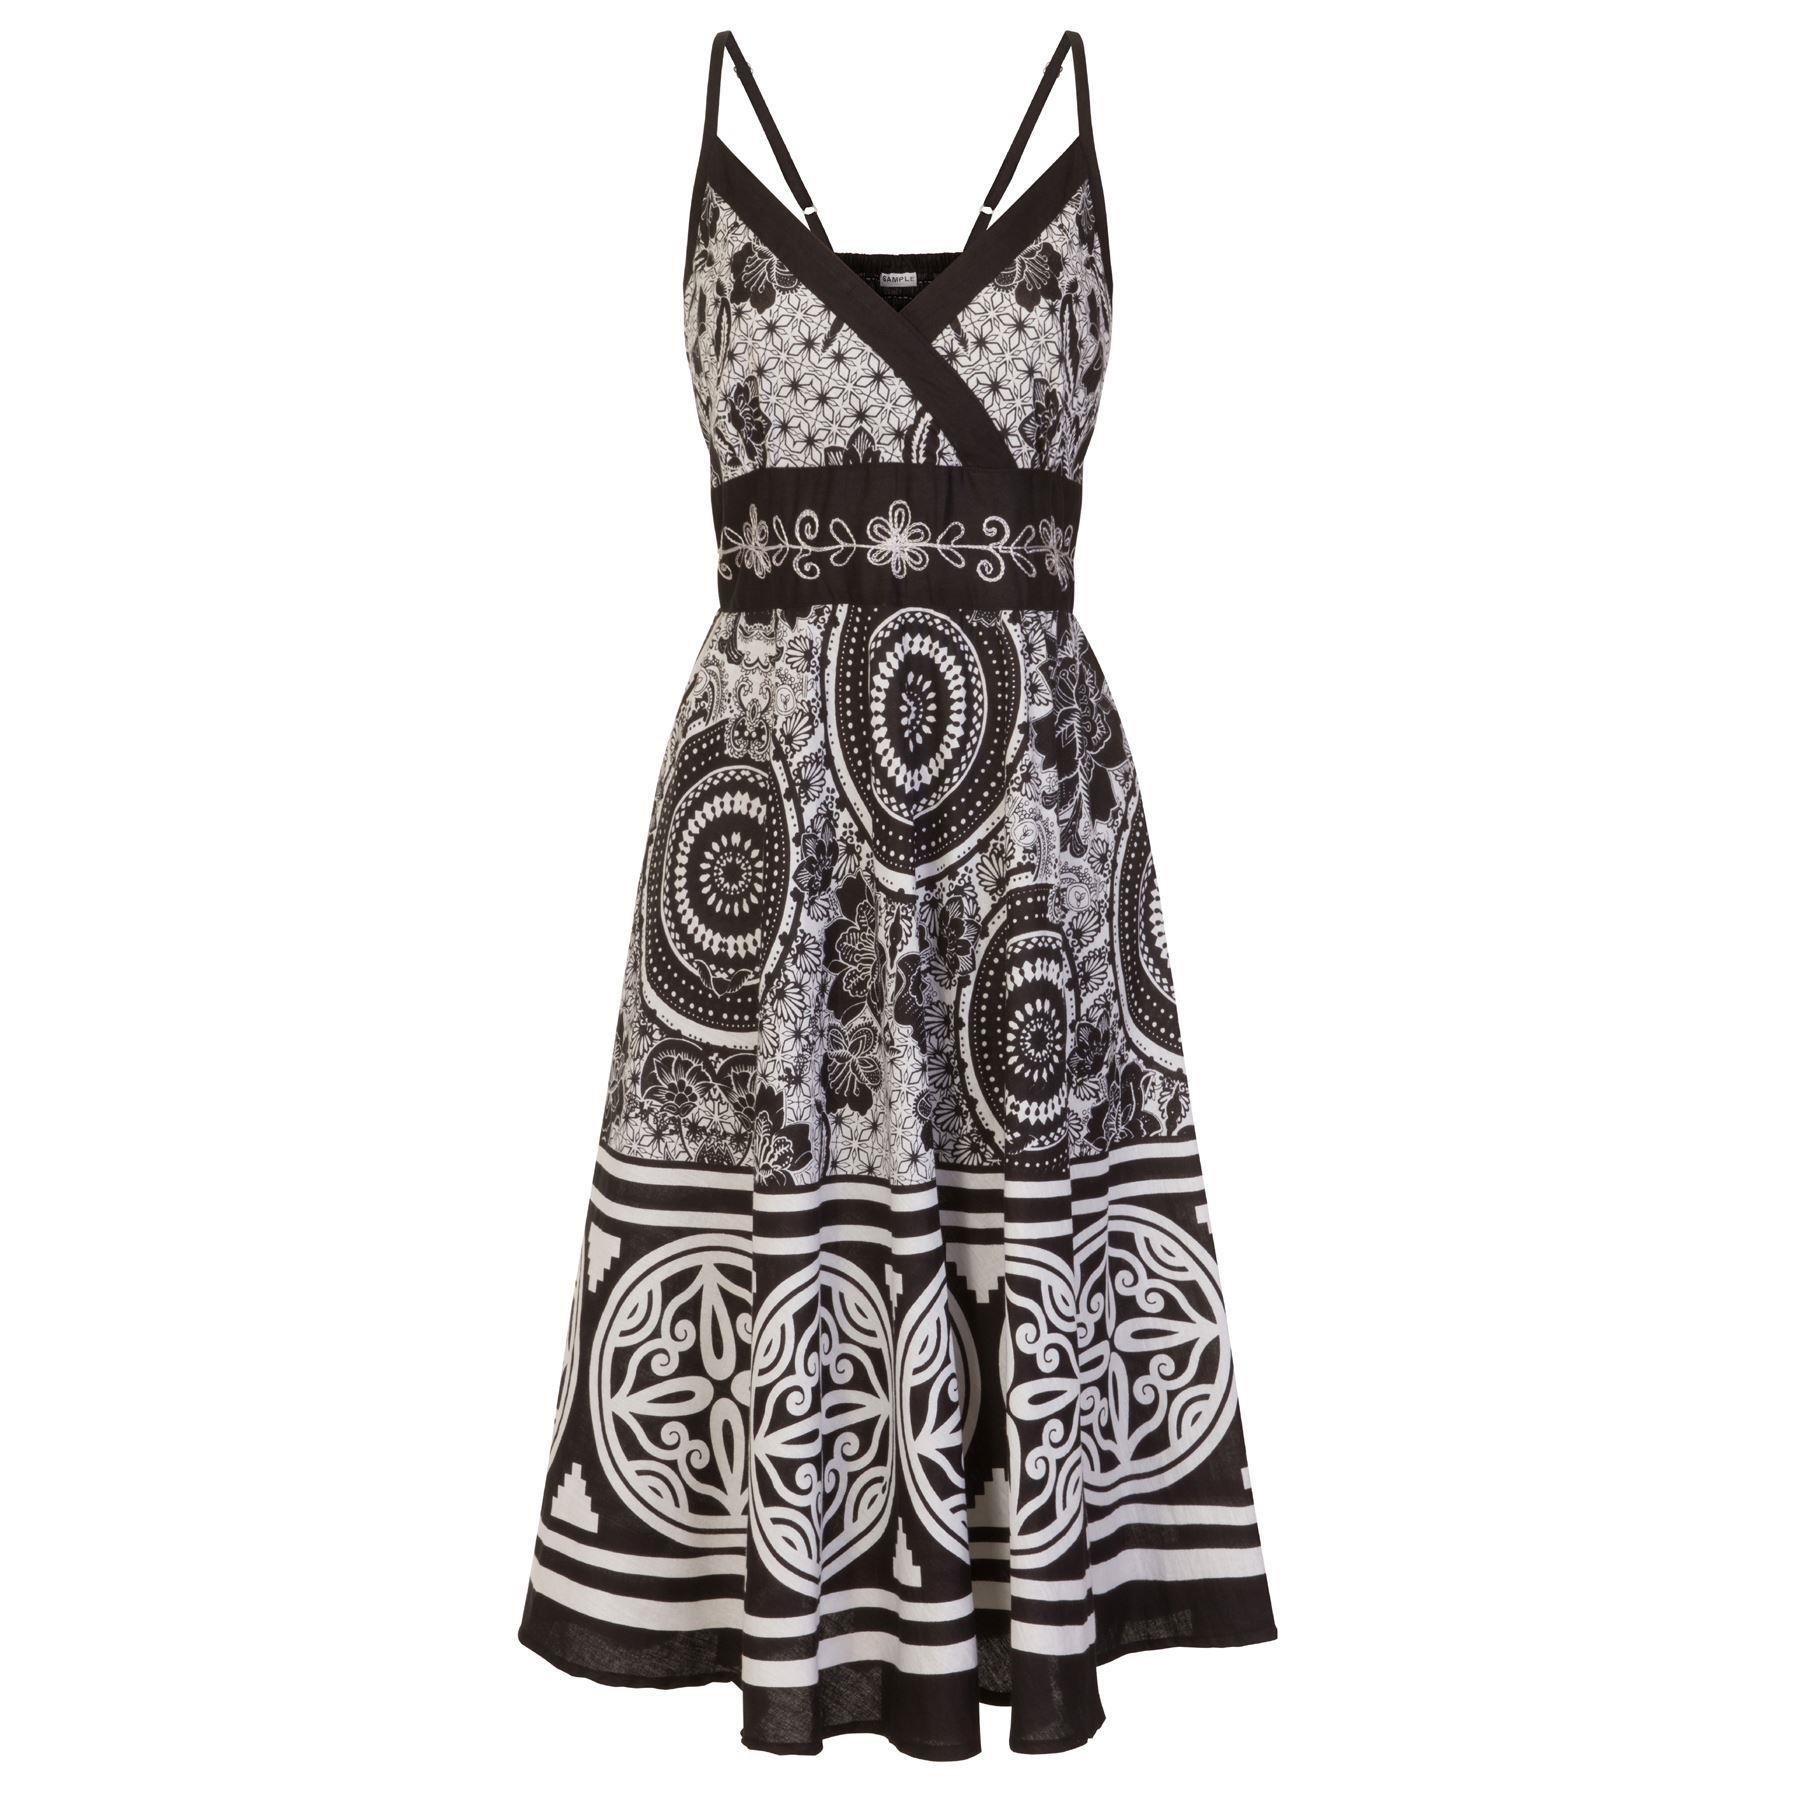 Pistachio Floral/Pattern Crossover Dress - Black